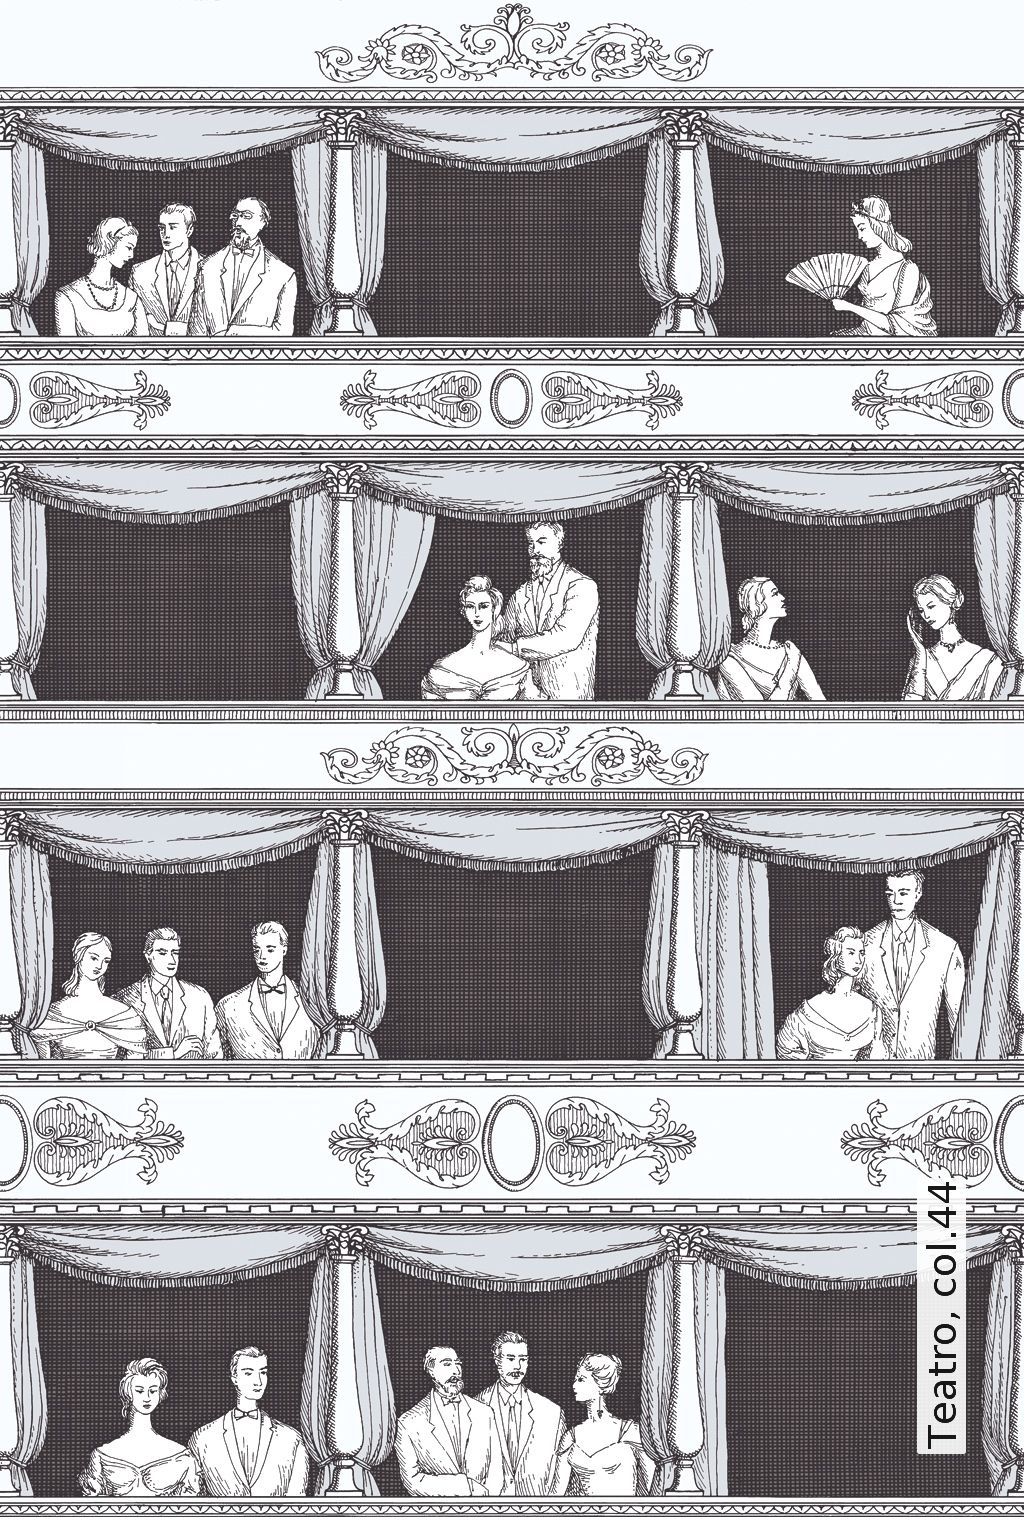 tapete teatro tapetenagentur schwarz wei tapeten pinterest tapeten wei e. Black Bedroom Furniture Sets. Home Design Ideas